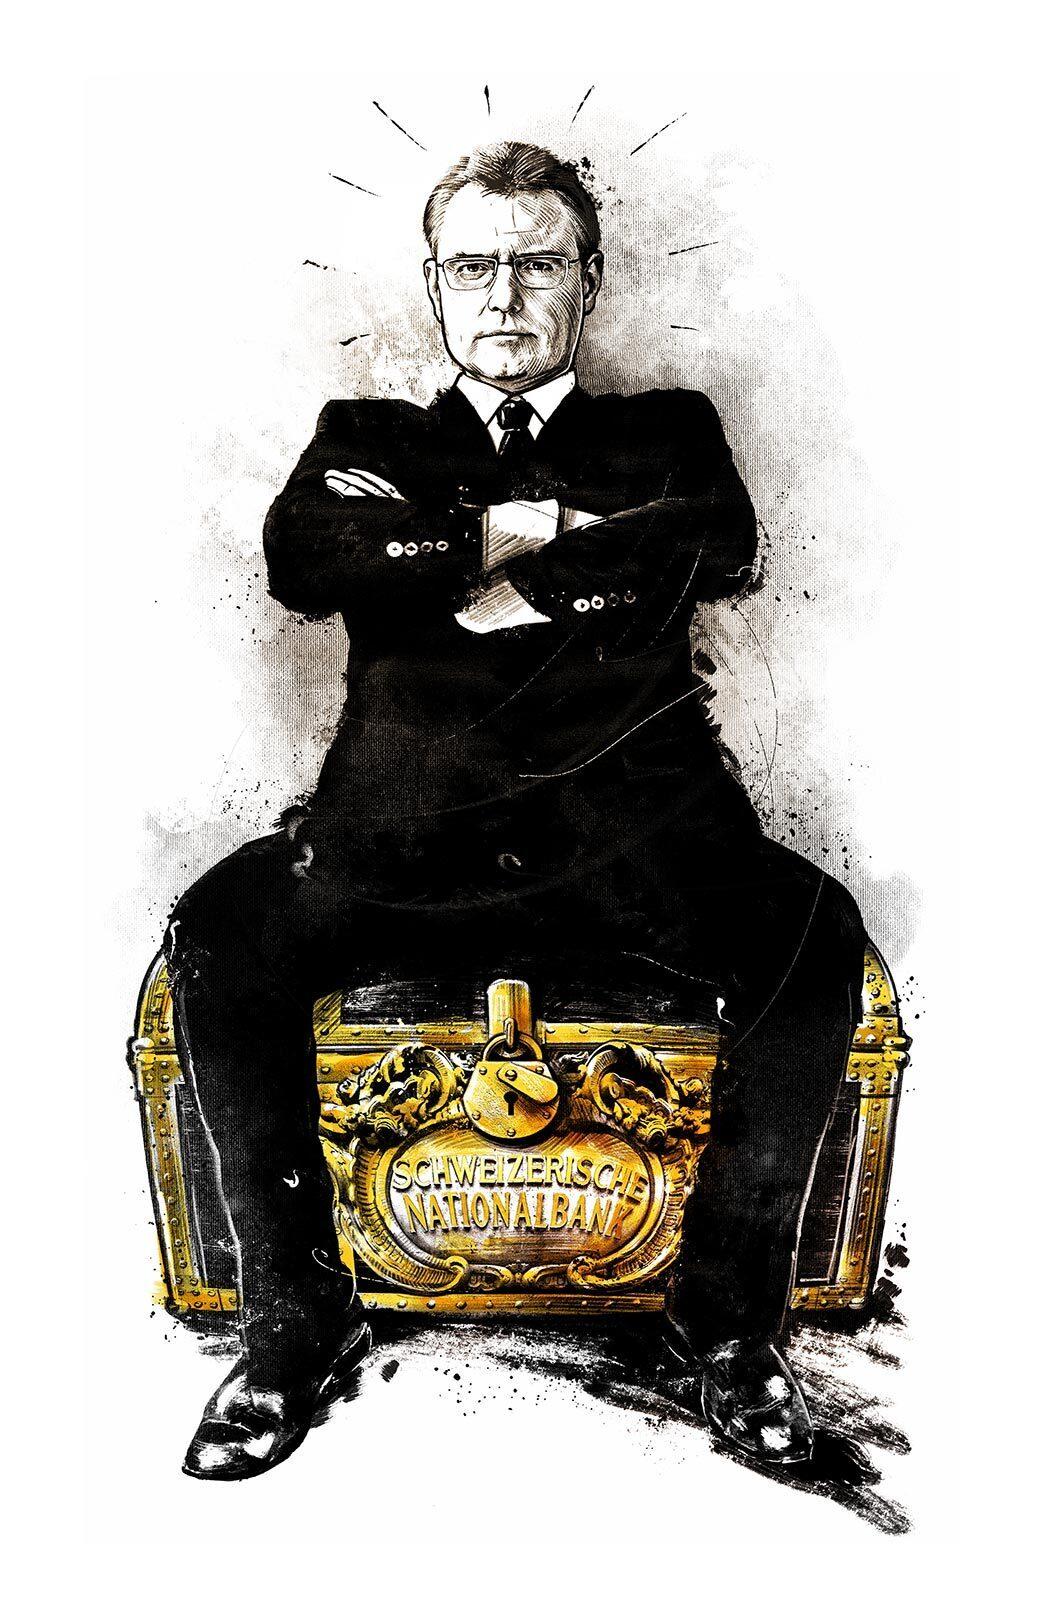 Illustration schweizer nationalbank SNB Praesident Thomas Jordan schatz tresor - Kornel Illustration | Kornel Stadler portfolio